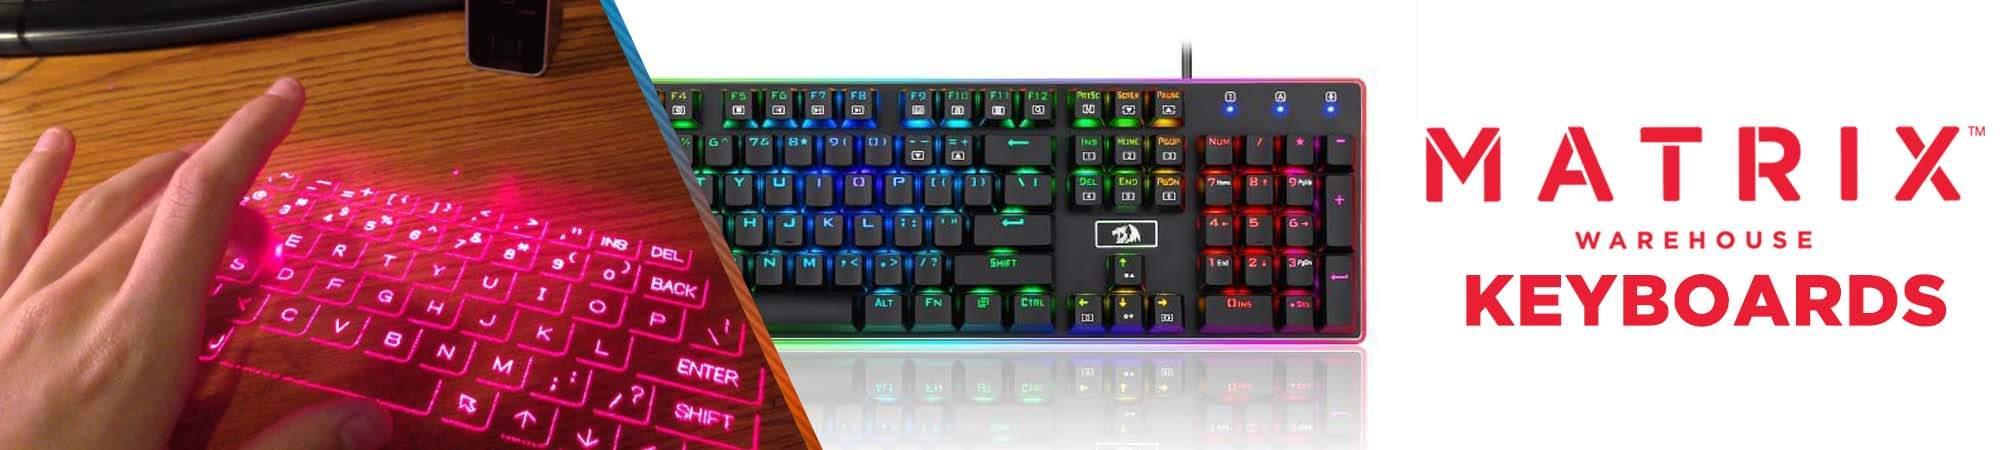 Keyboards Page September 2021